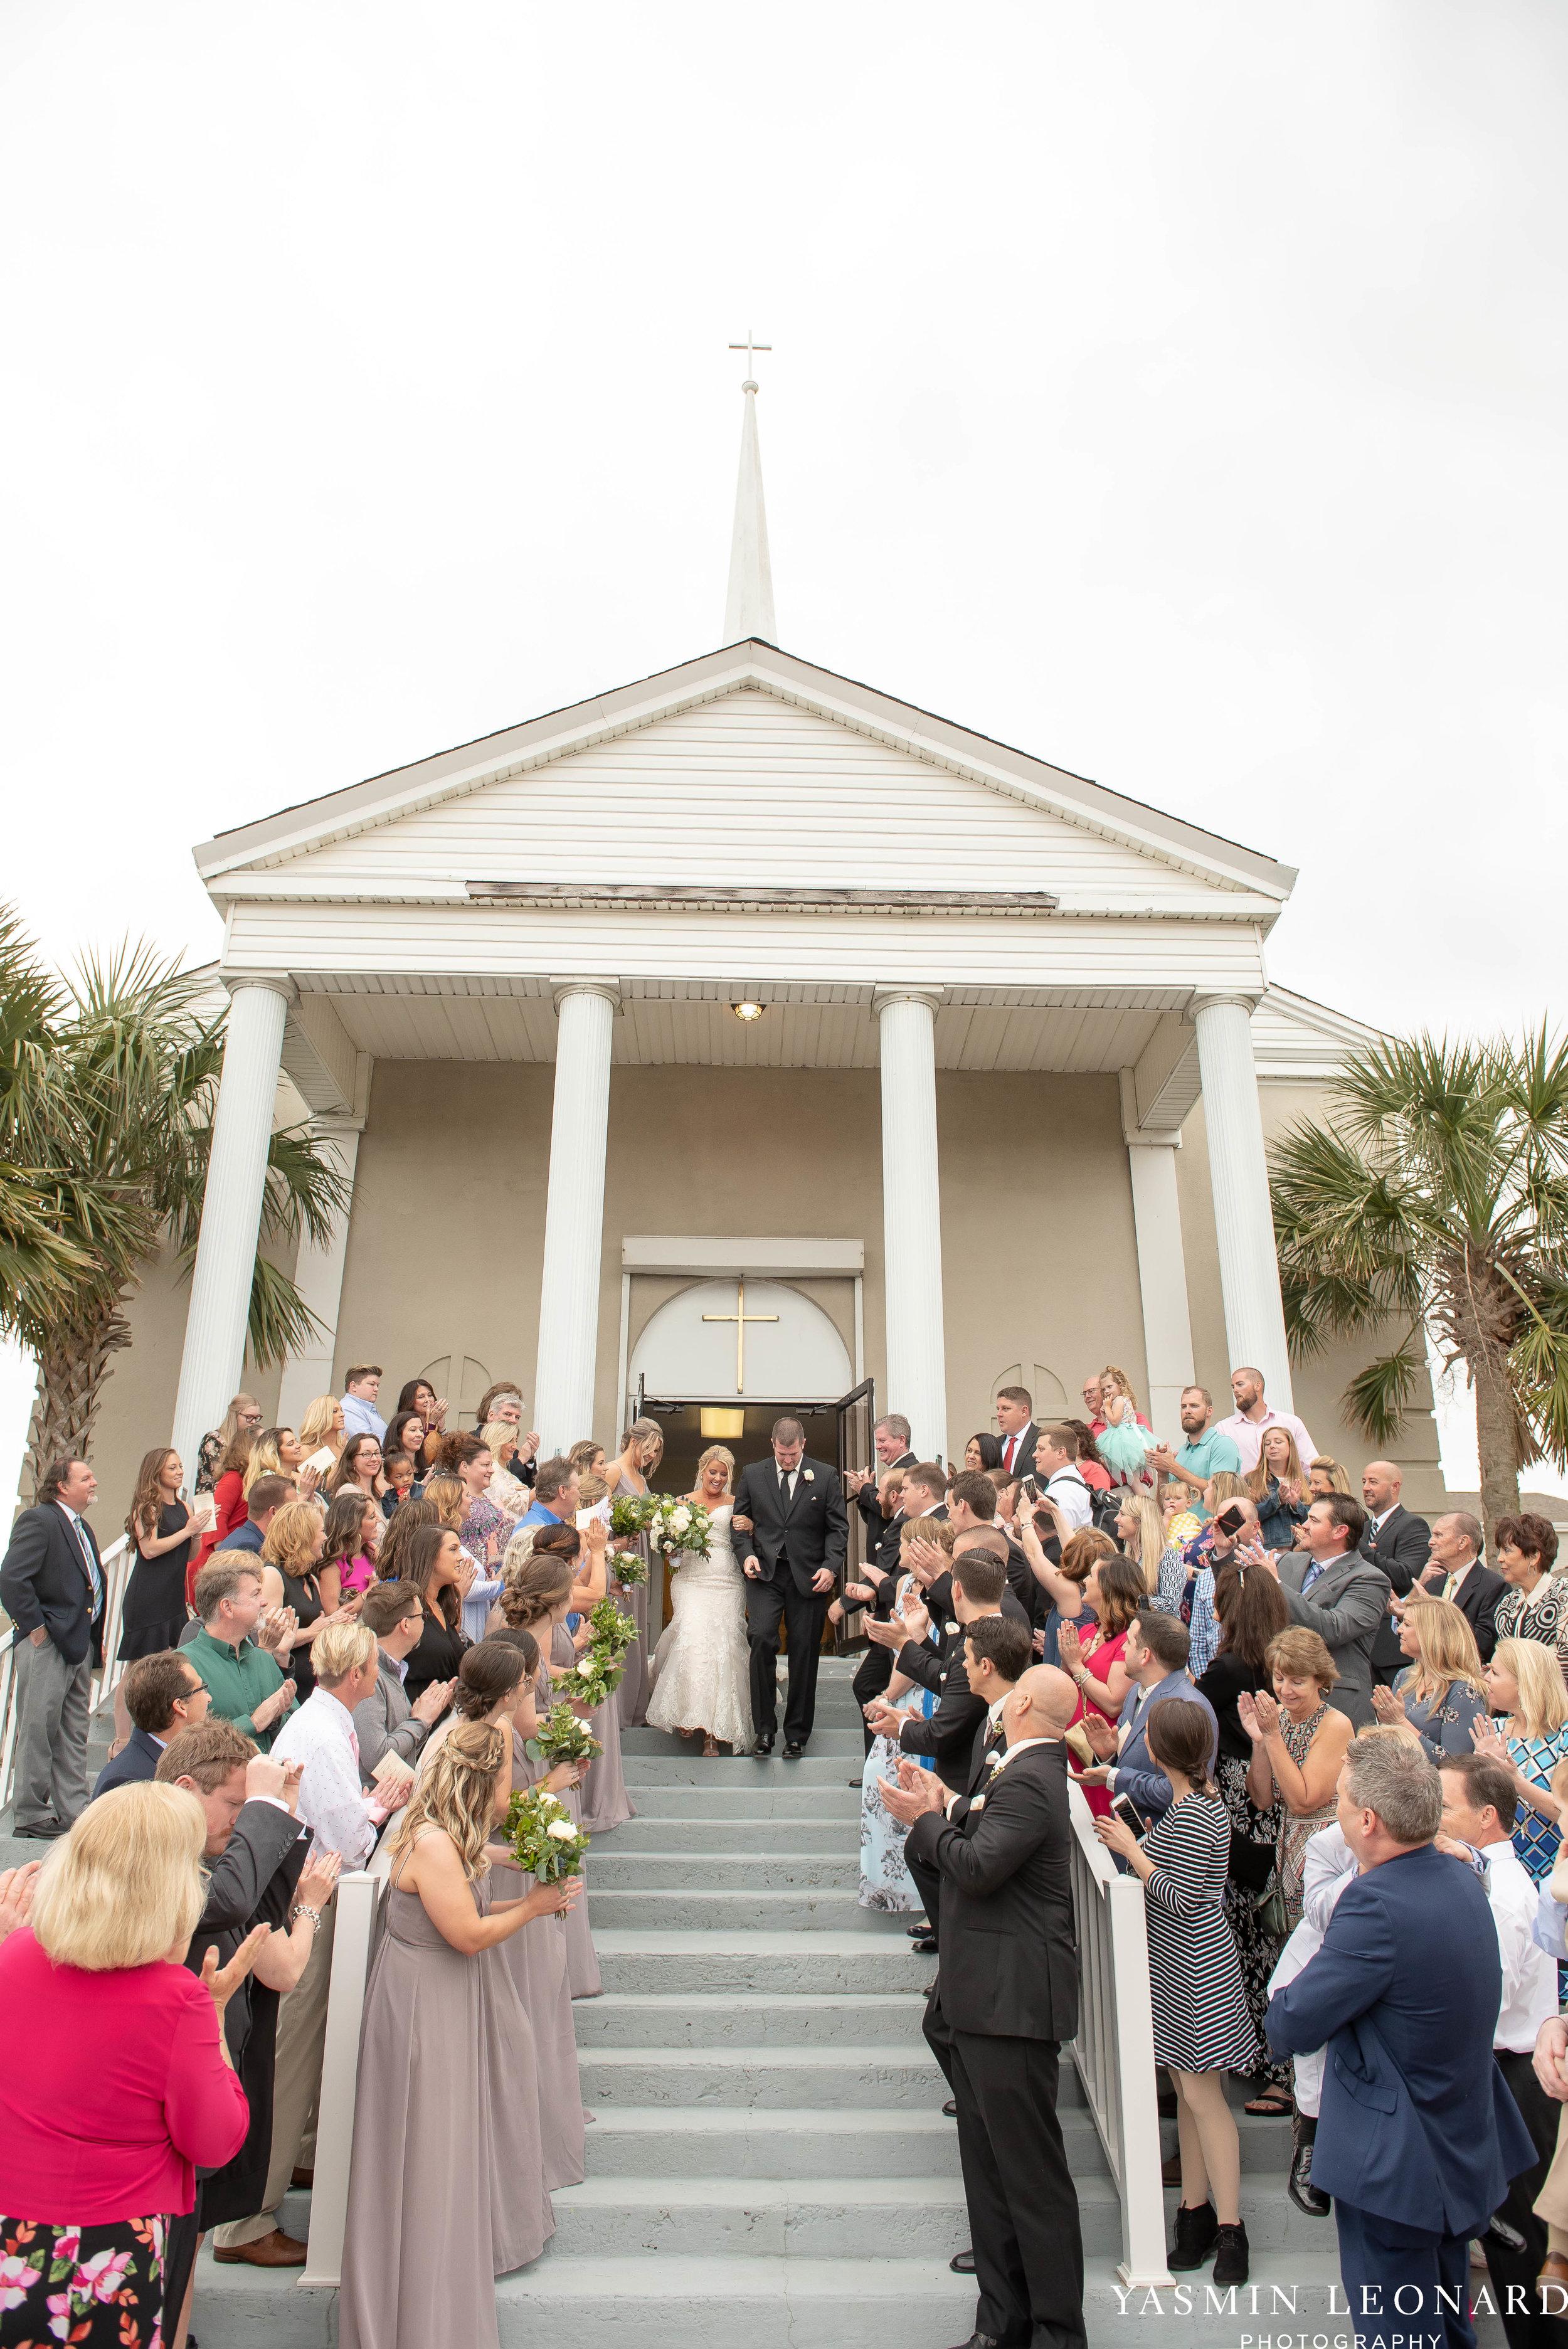 Carolina Beach Wedding - Fort Fisher Wedding - NC Acquarium - Beach Wedding - NC Wedding - Beach Wedding Inspiration - Beach Bride-22.jpg